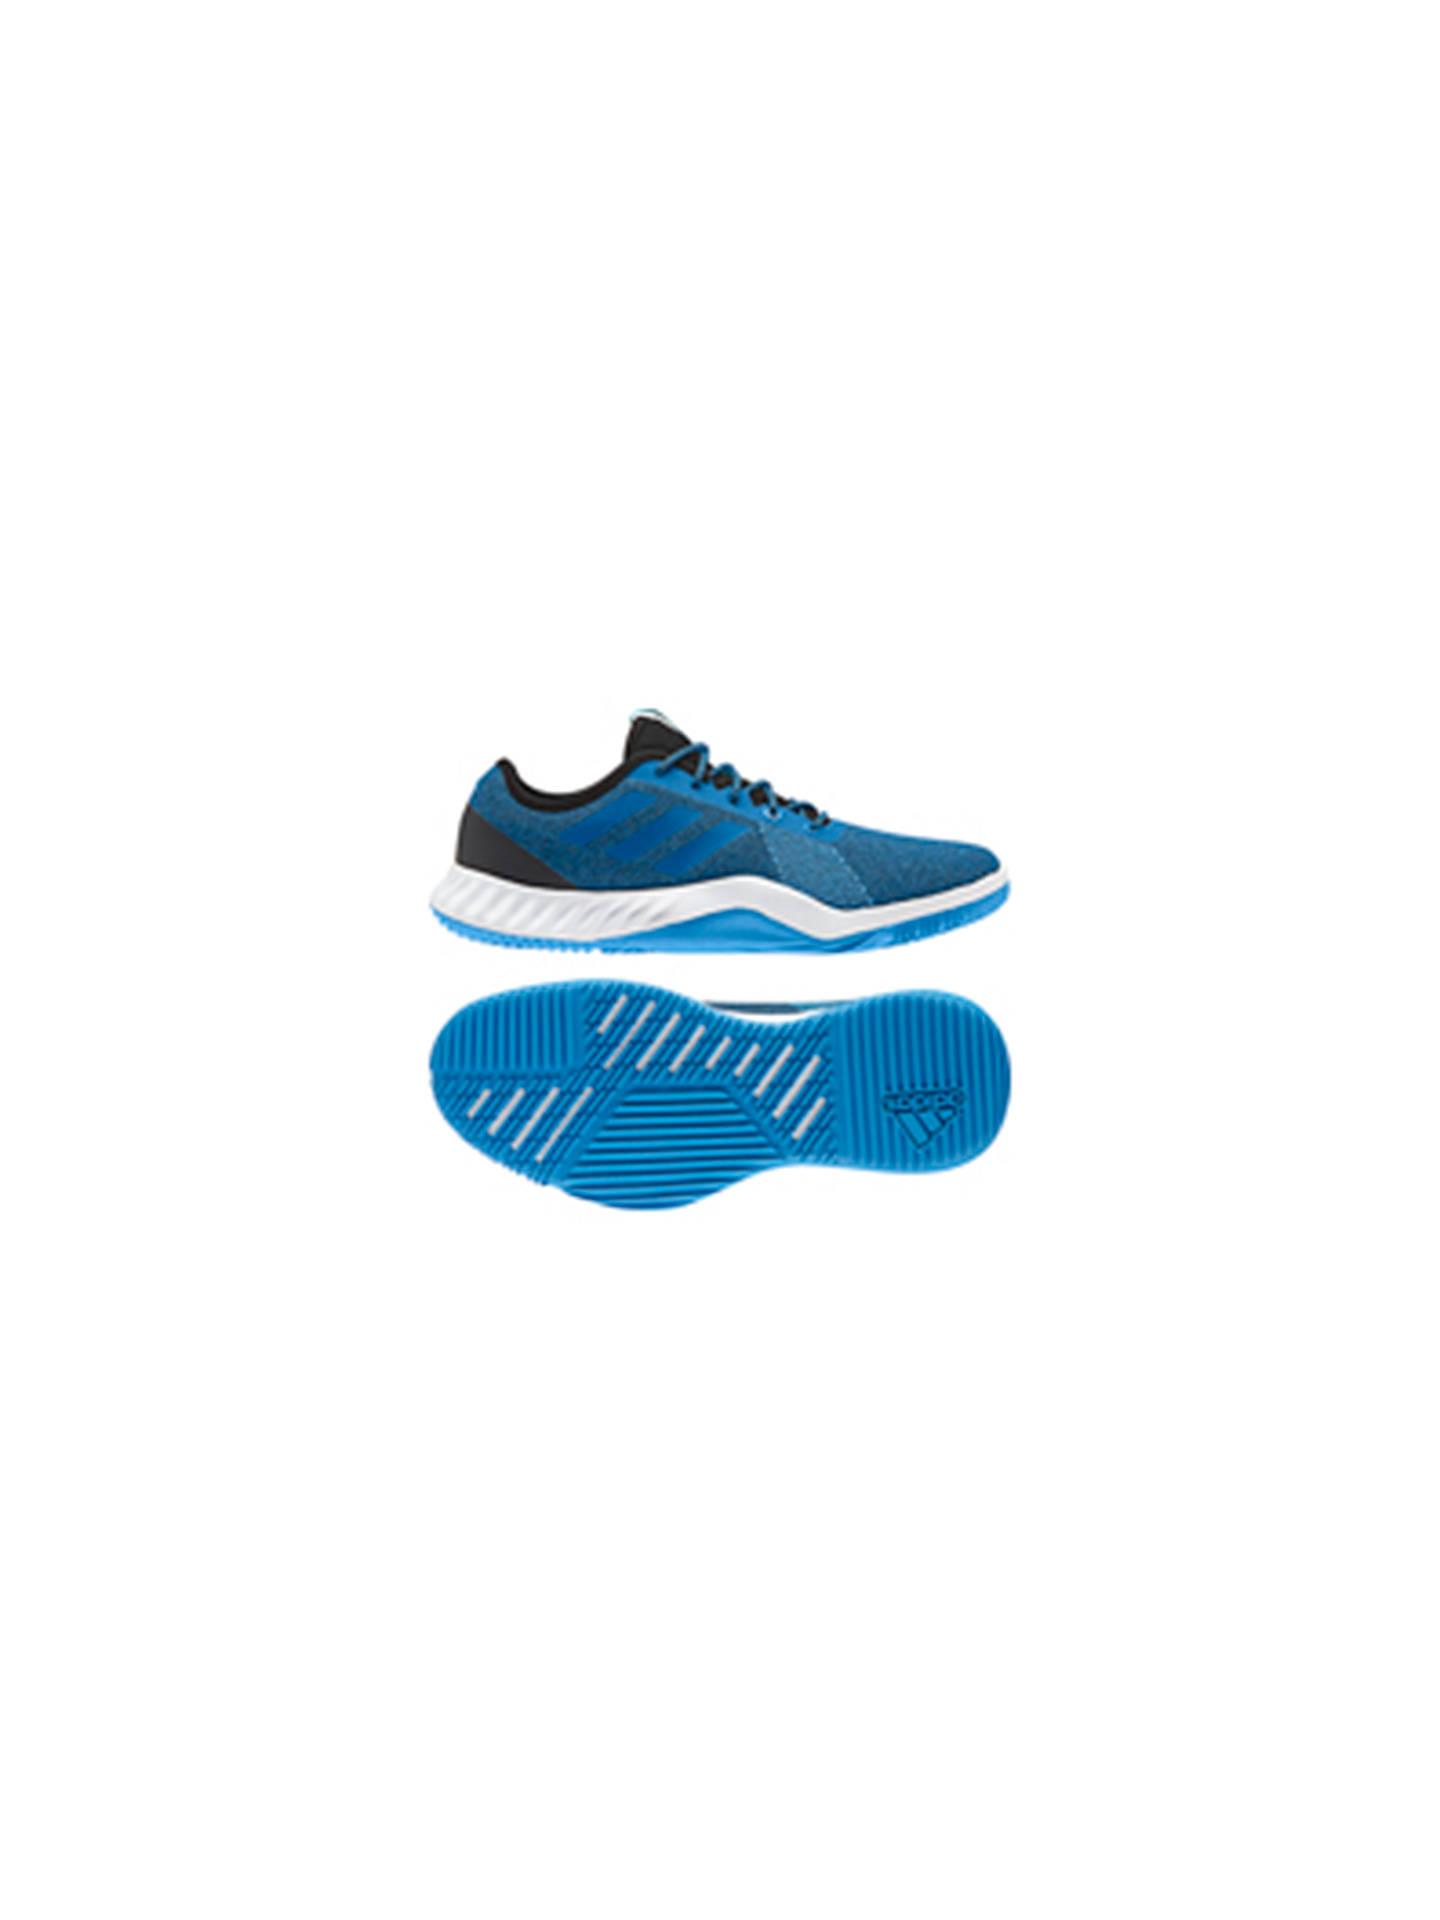 f10250d453939 Buy adidas CrazyTrain LT Men s Training Shoes